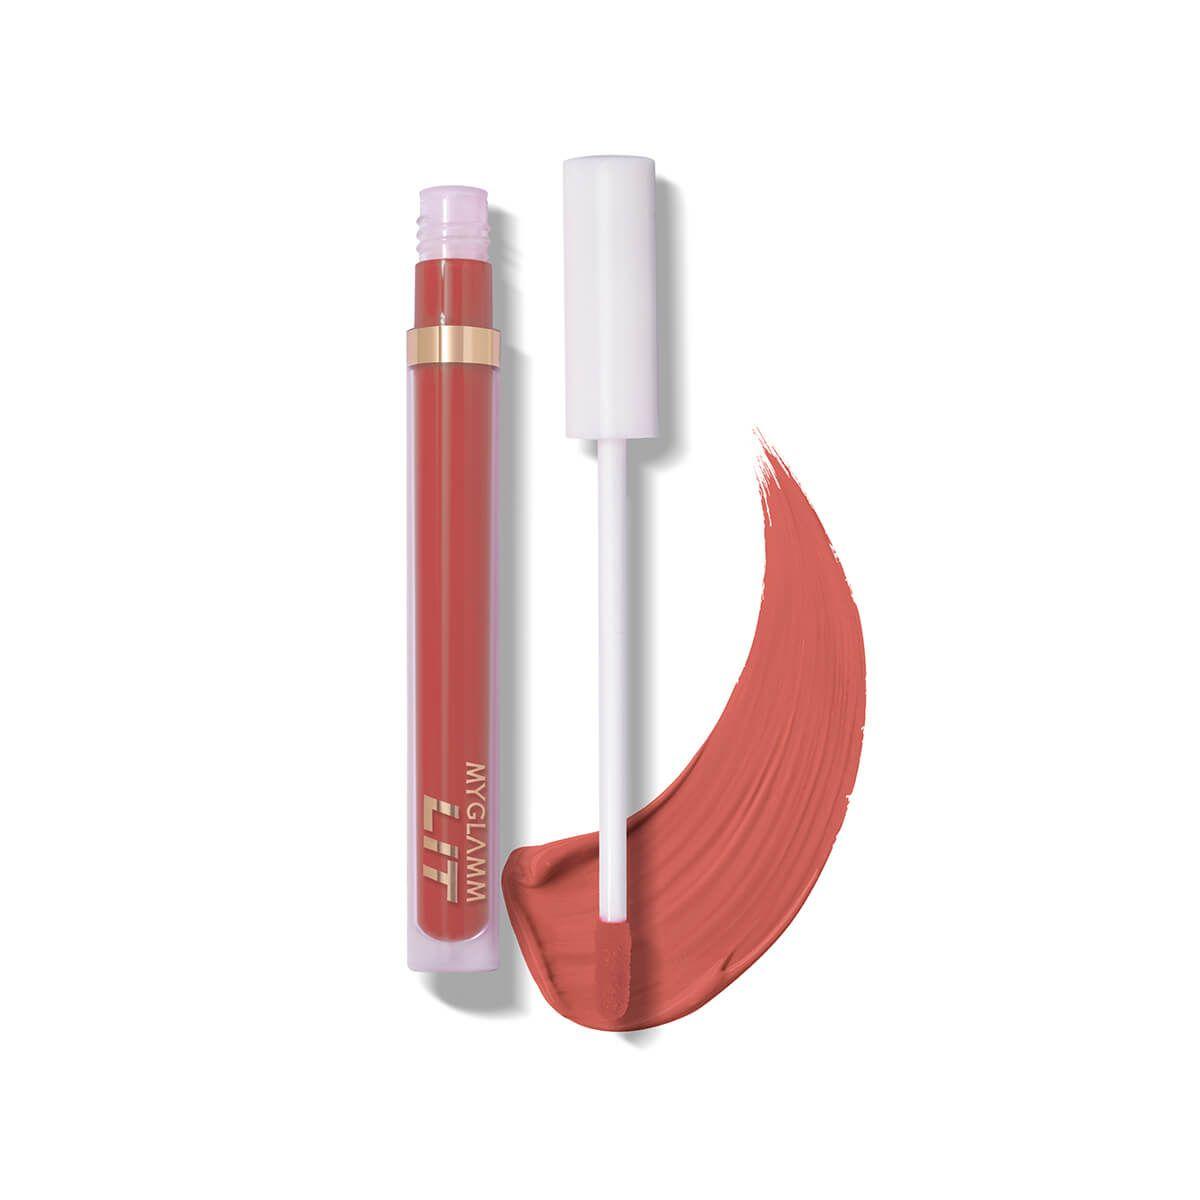 LIT Liquid Matte Lipstick - Swinger